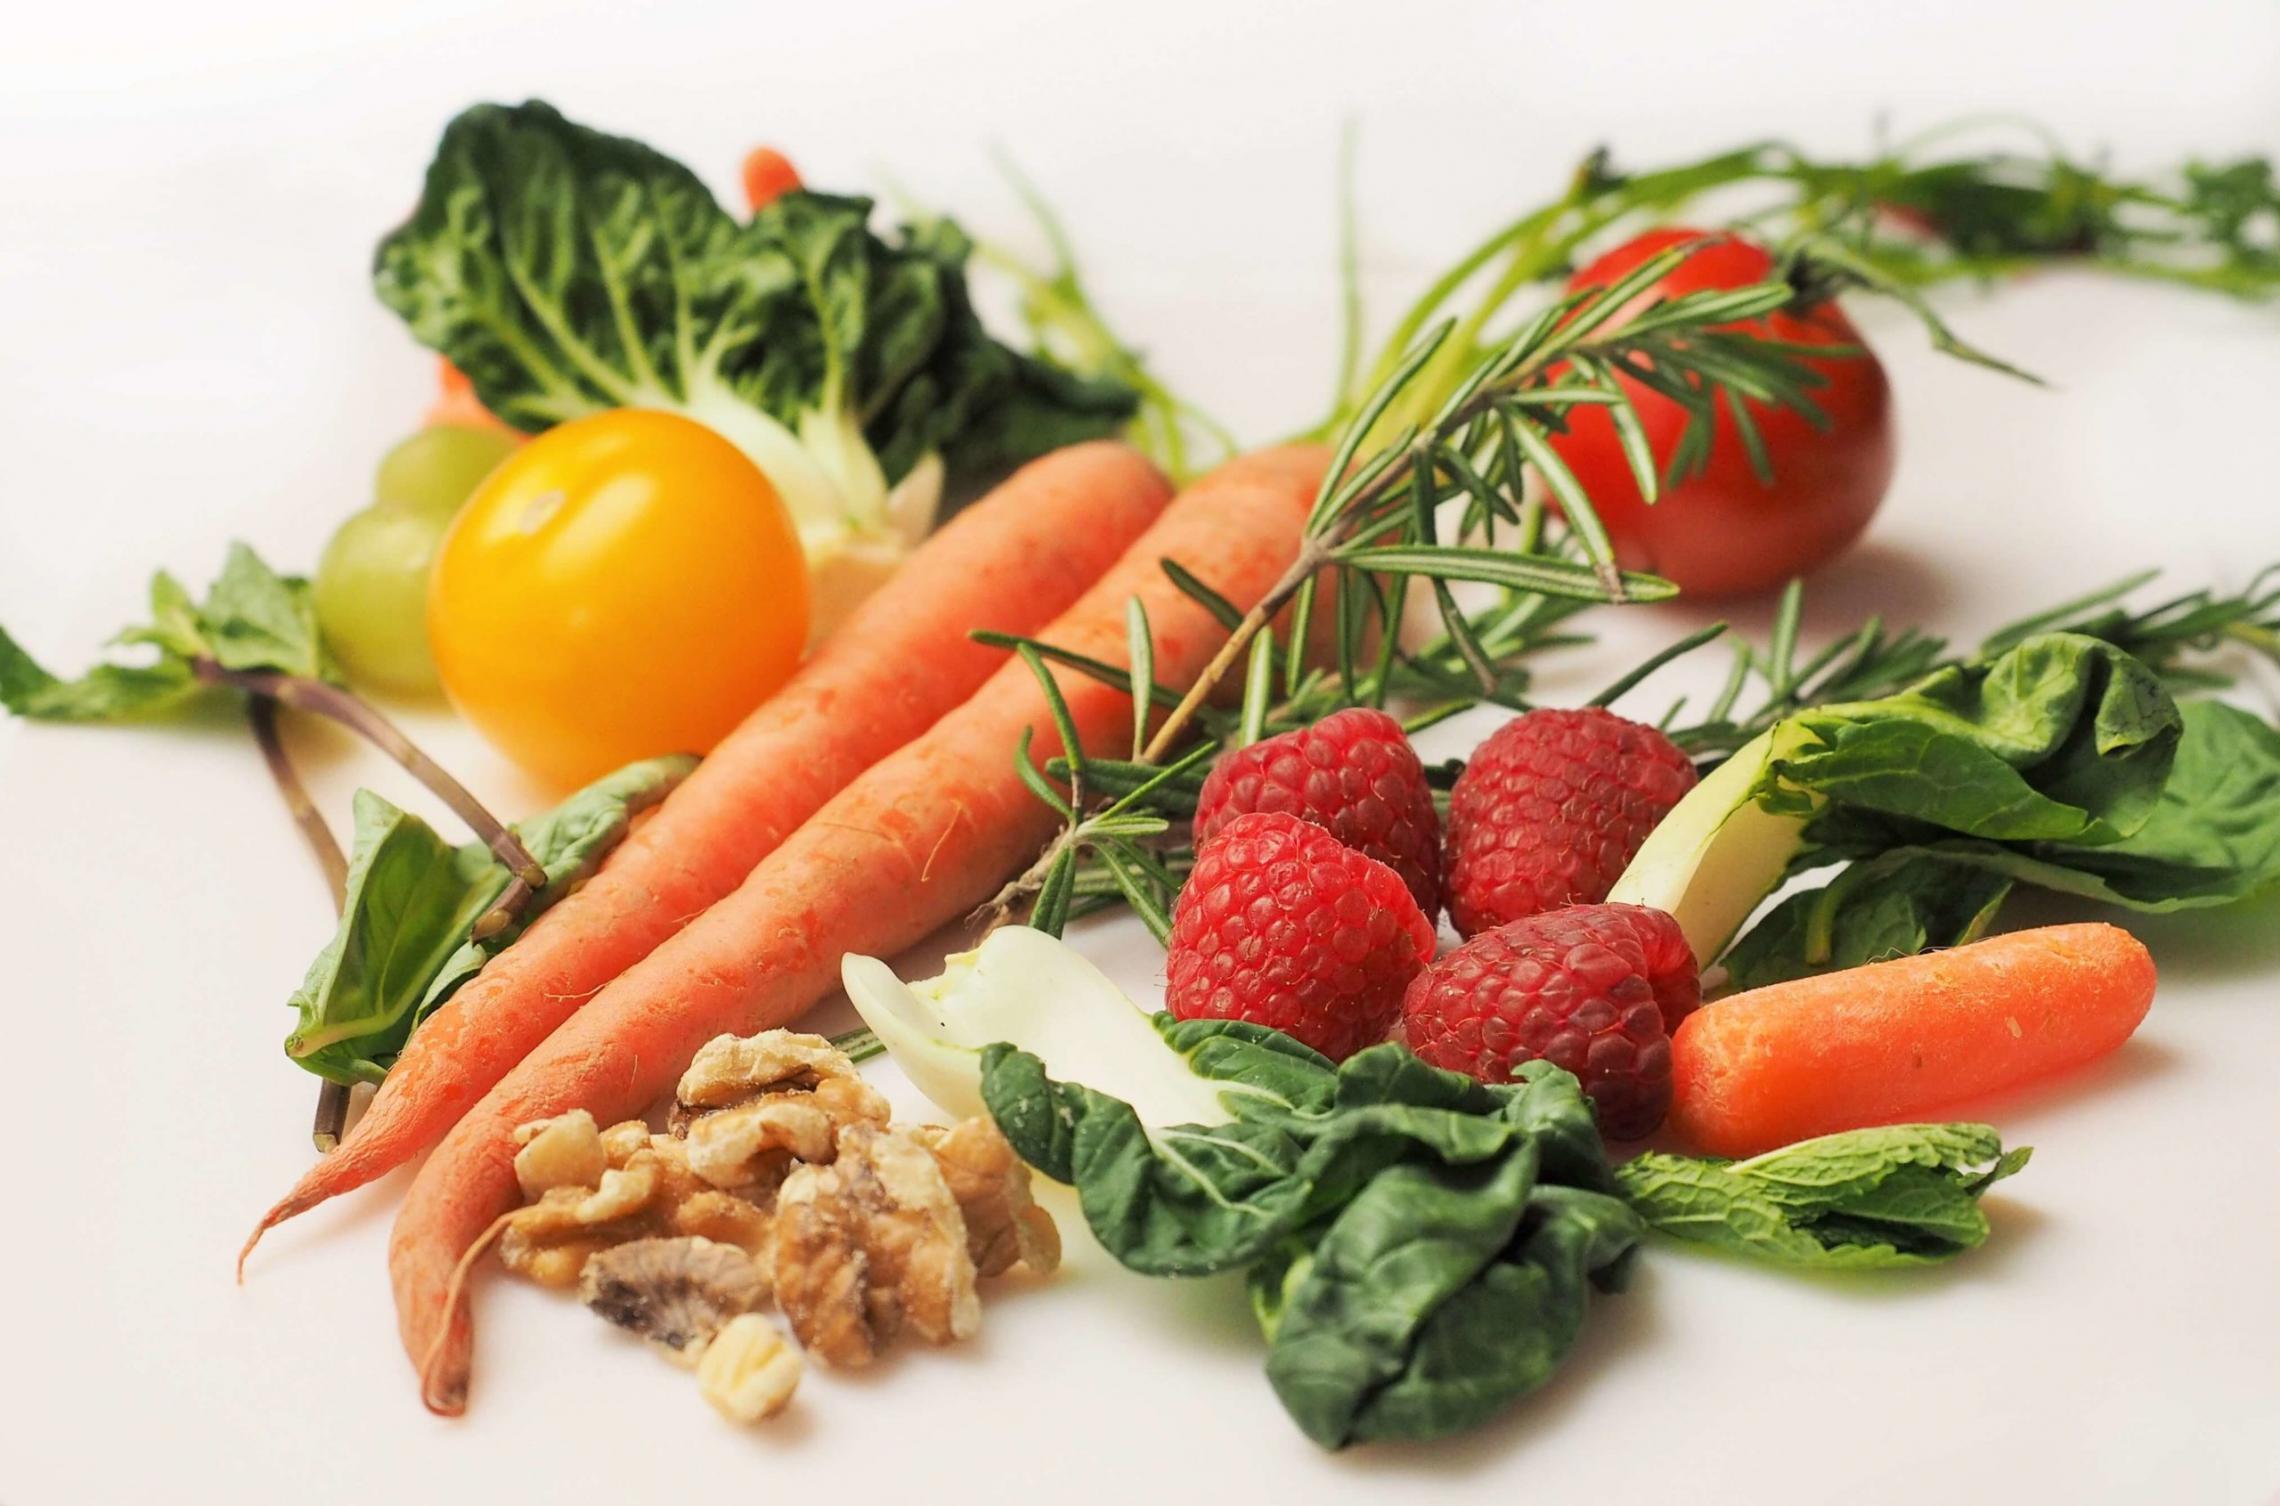 légumes contenant du beta carotène 2